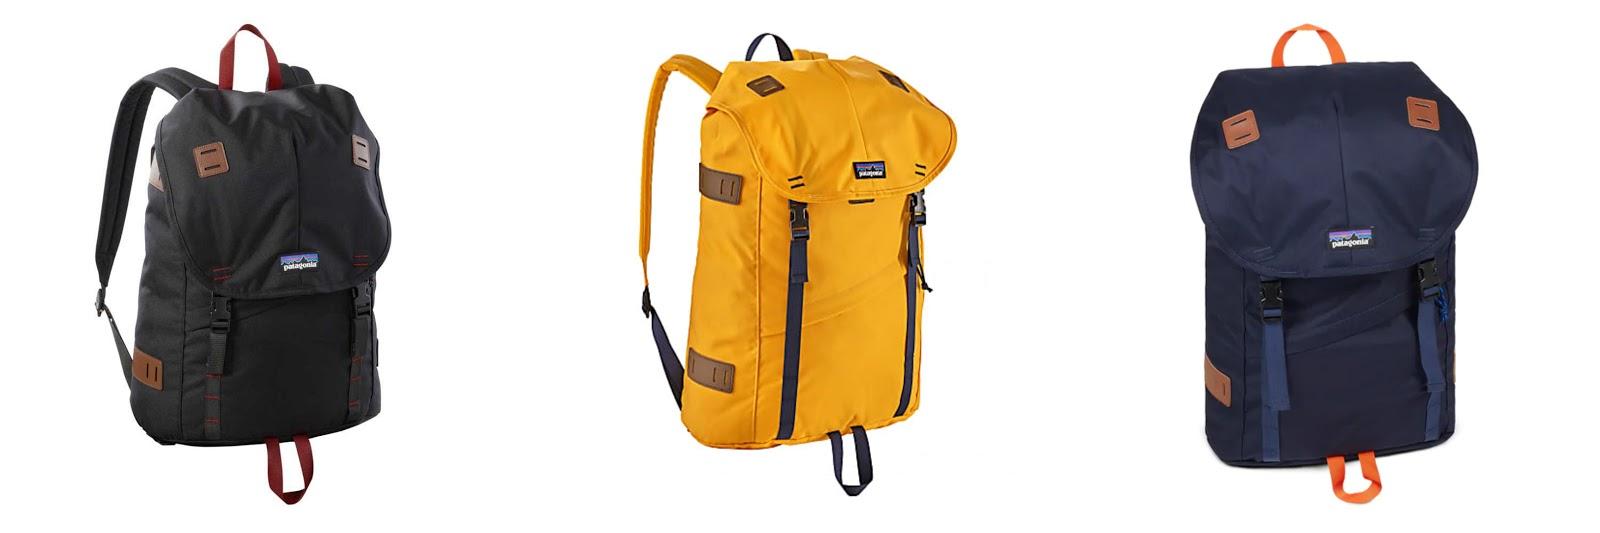 Patagonia Arbor Backpack